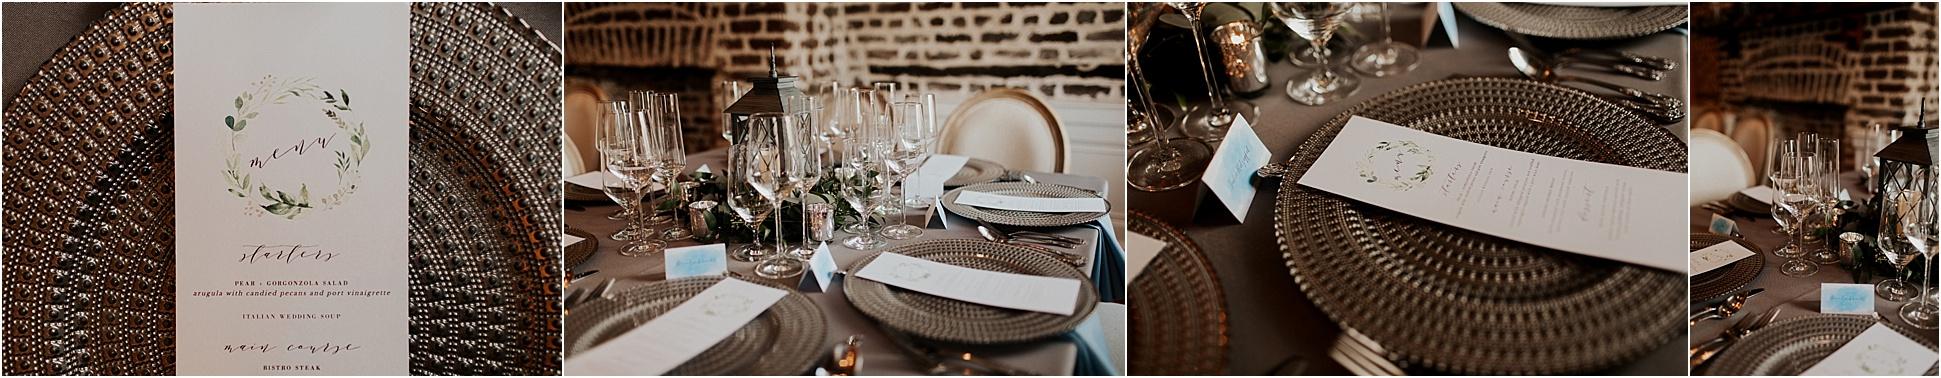 upstairs_midtown_intimate_charleston_wedding029.JPG